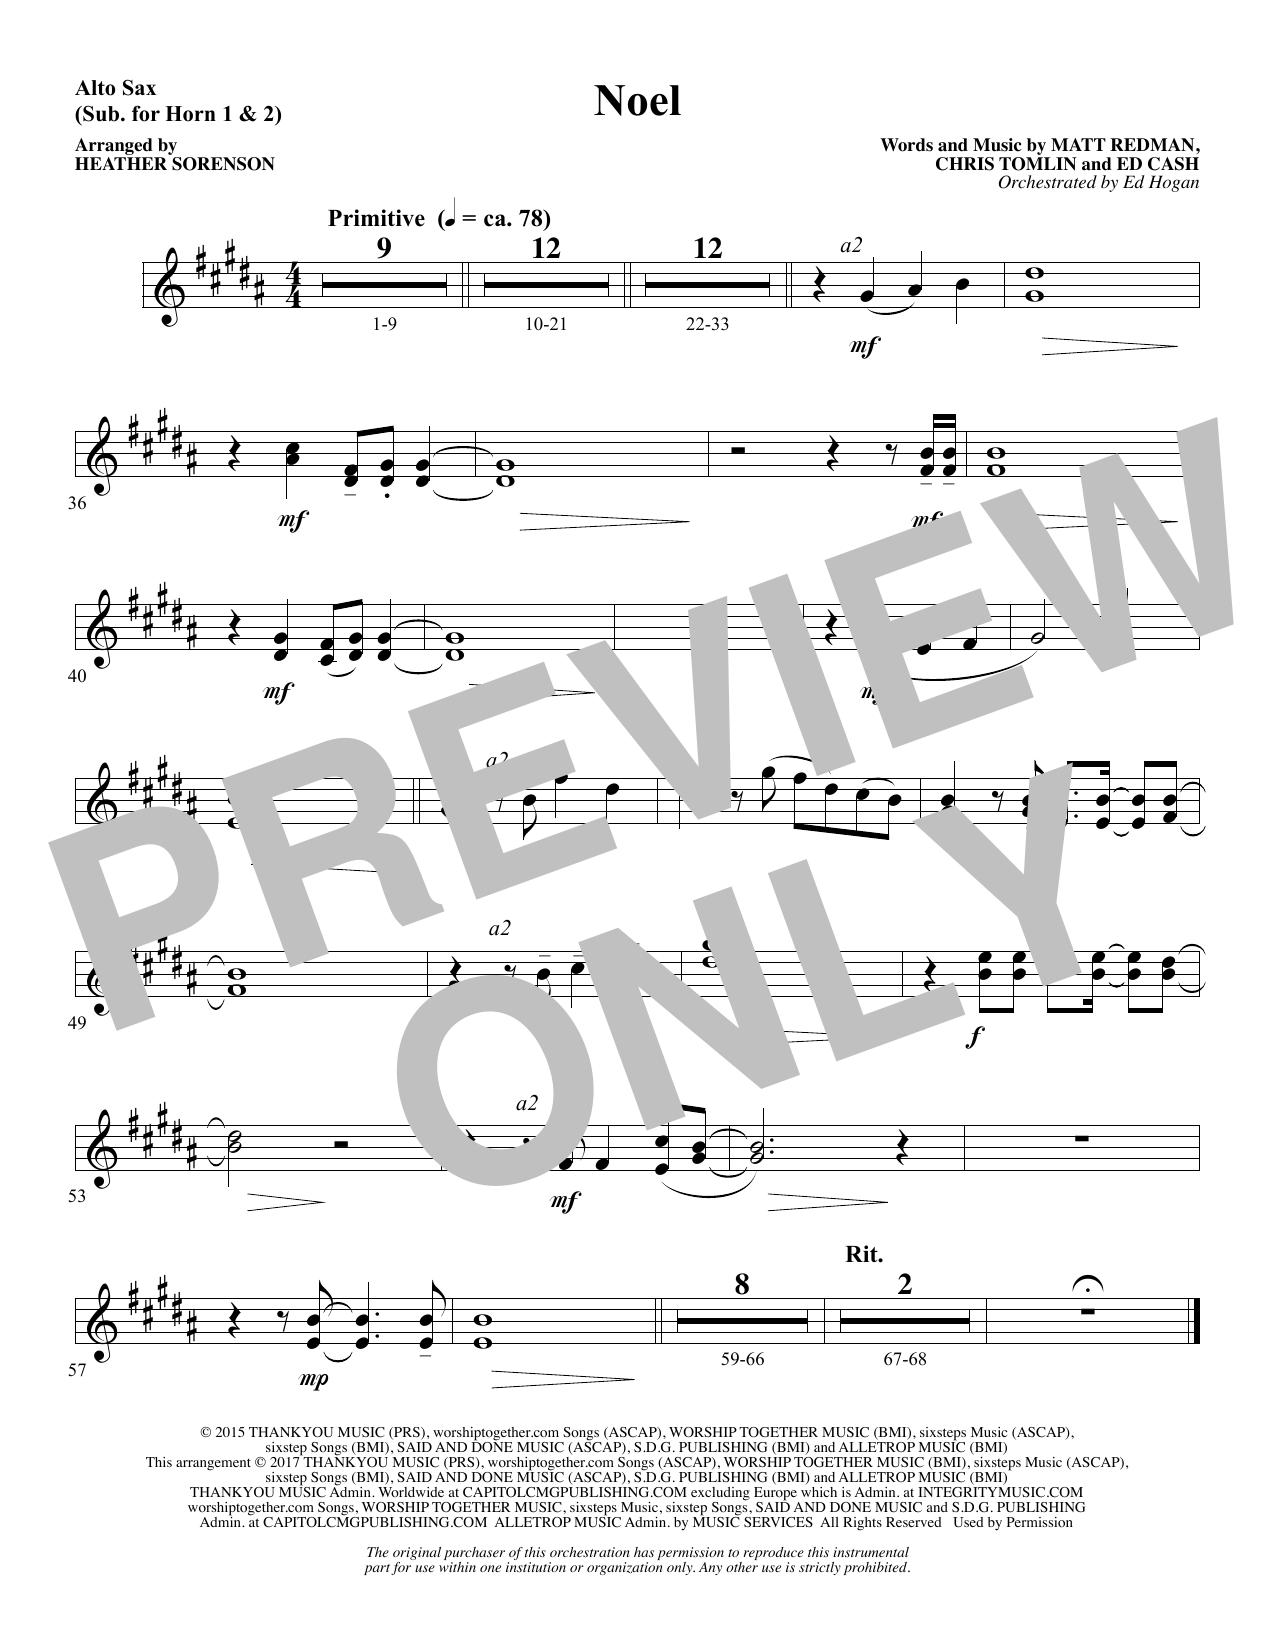 Noel (feat. Lauren Daigle) (arr. Heather Sorenson) - Alto Sax 1 & 2 (Sub. Horn) (Choir Instrumental Pak)